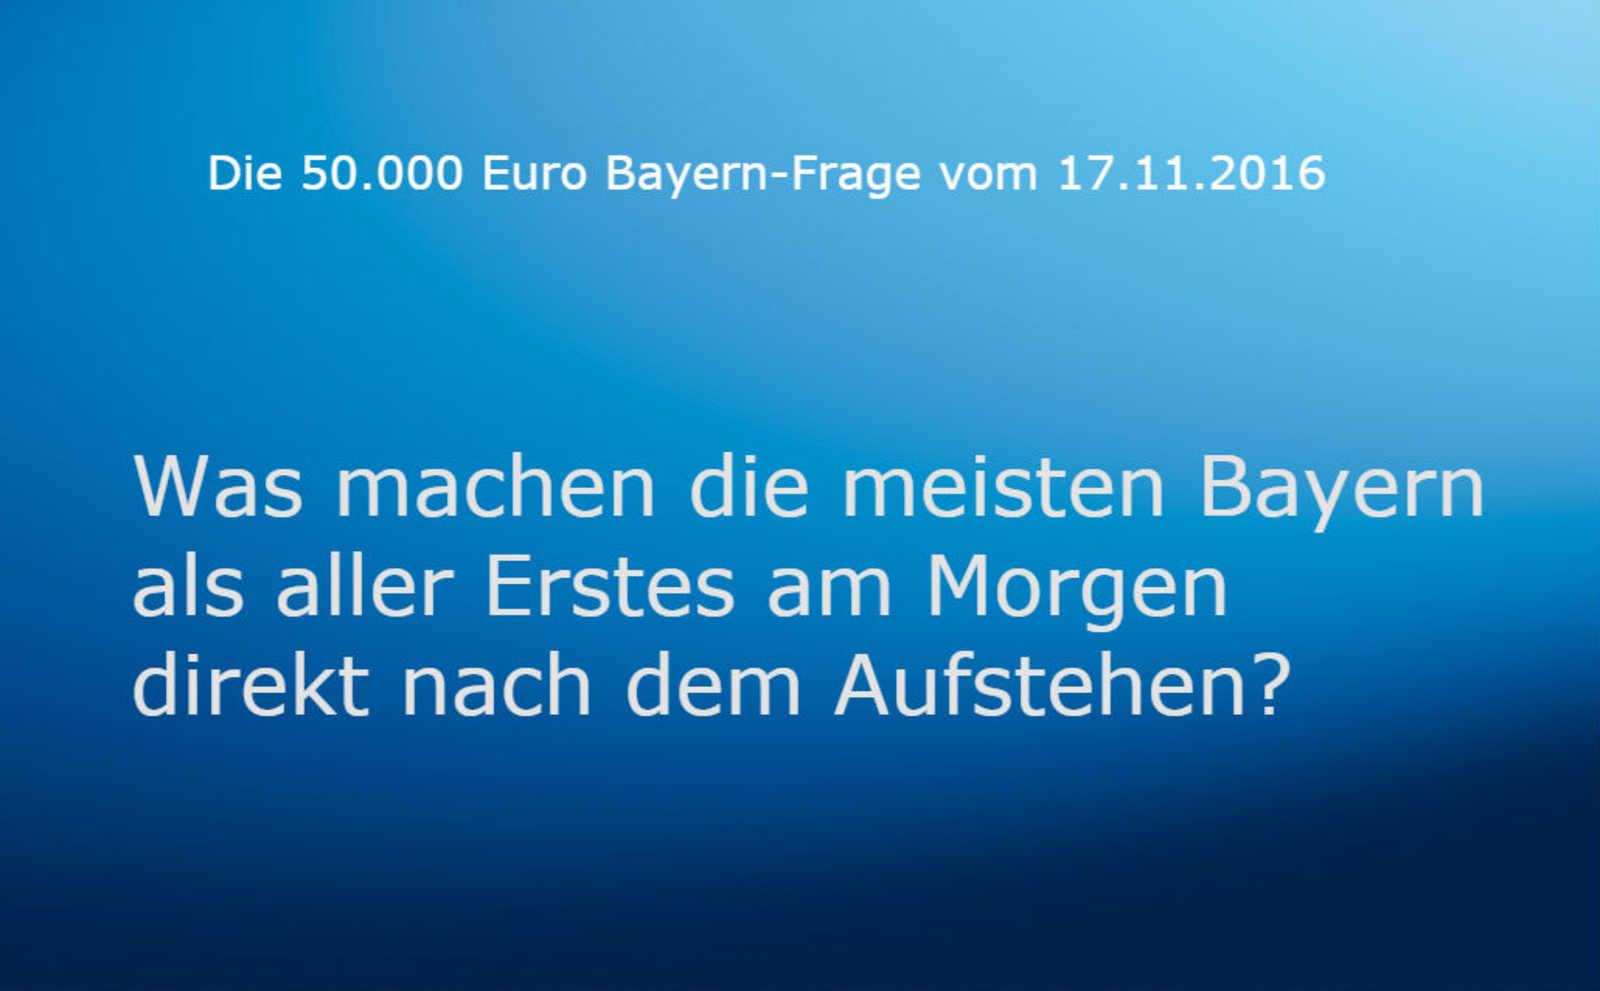 bayernfrage_1711n